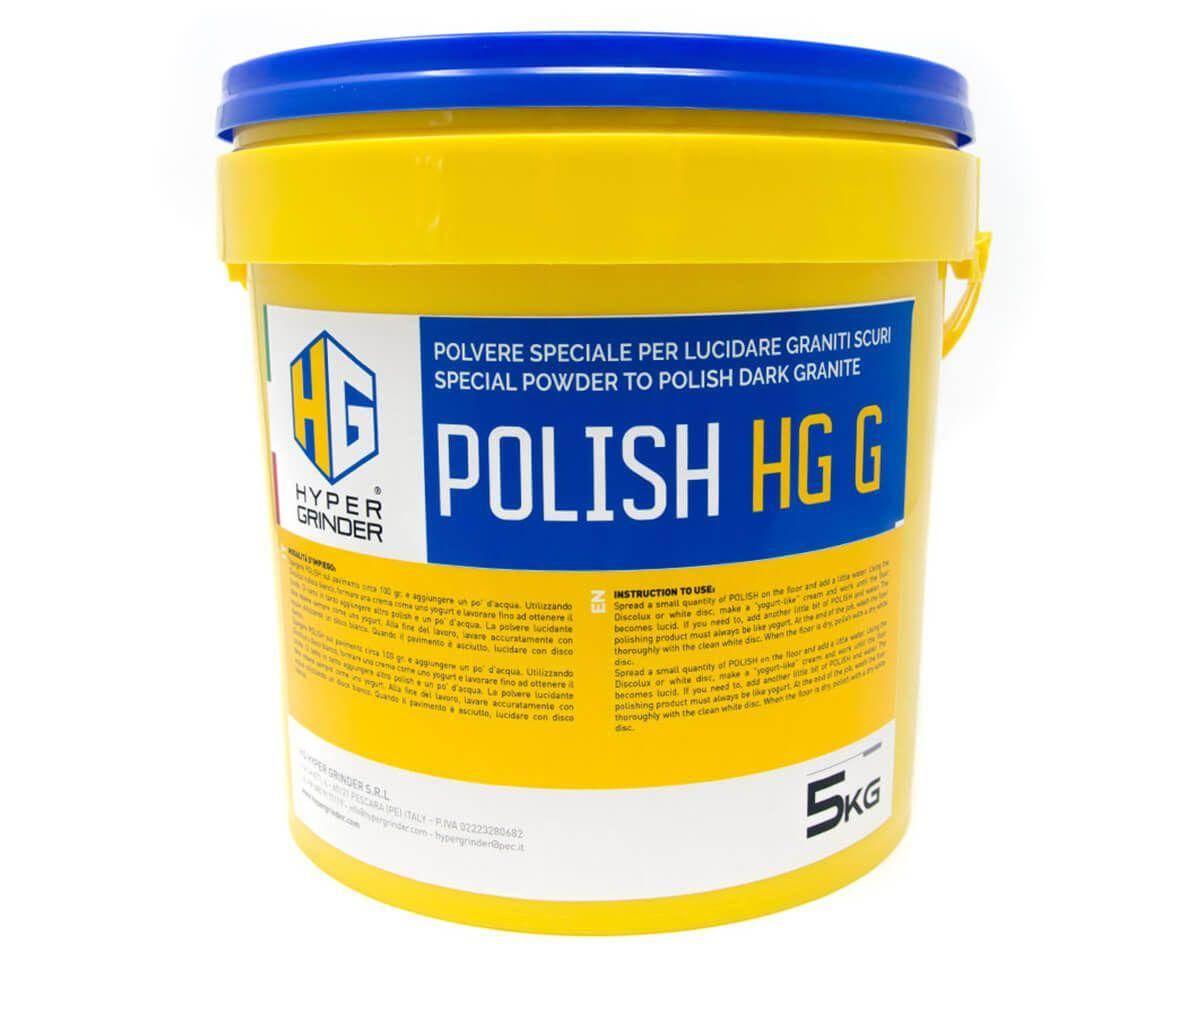 polishhgG 1238